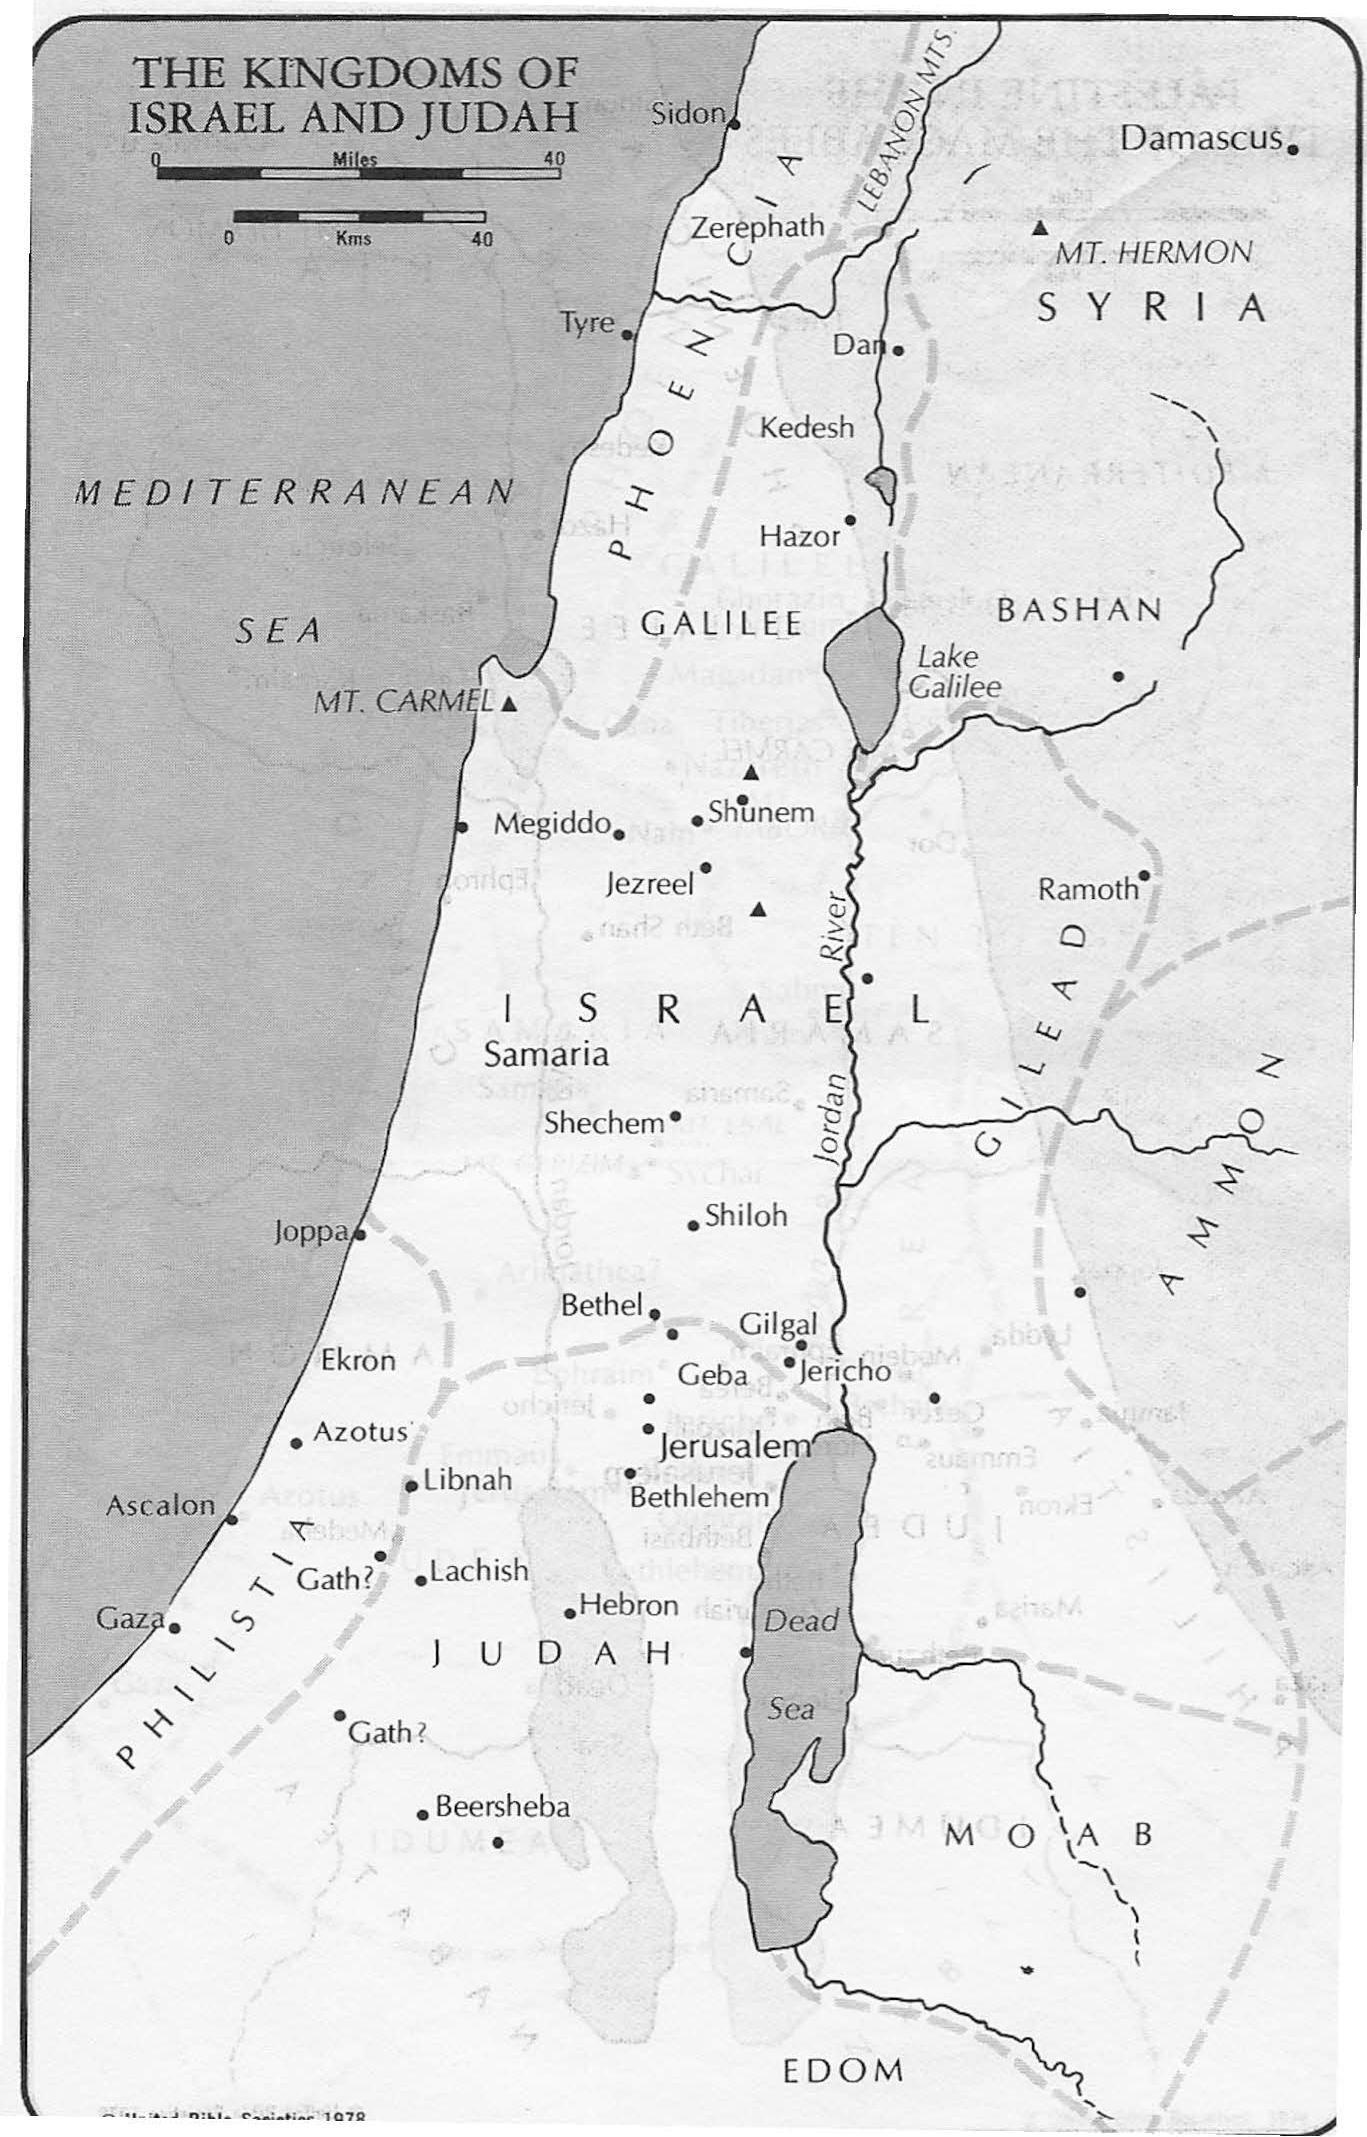 The Kingdoms Of Israel And Judah